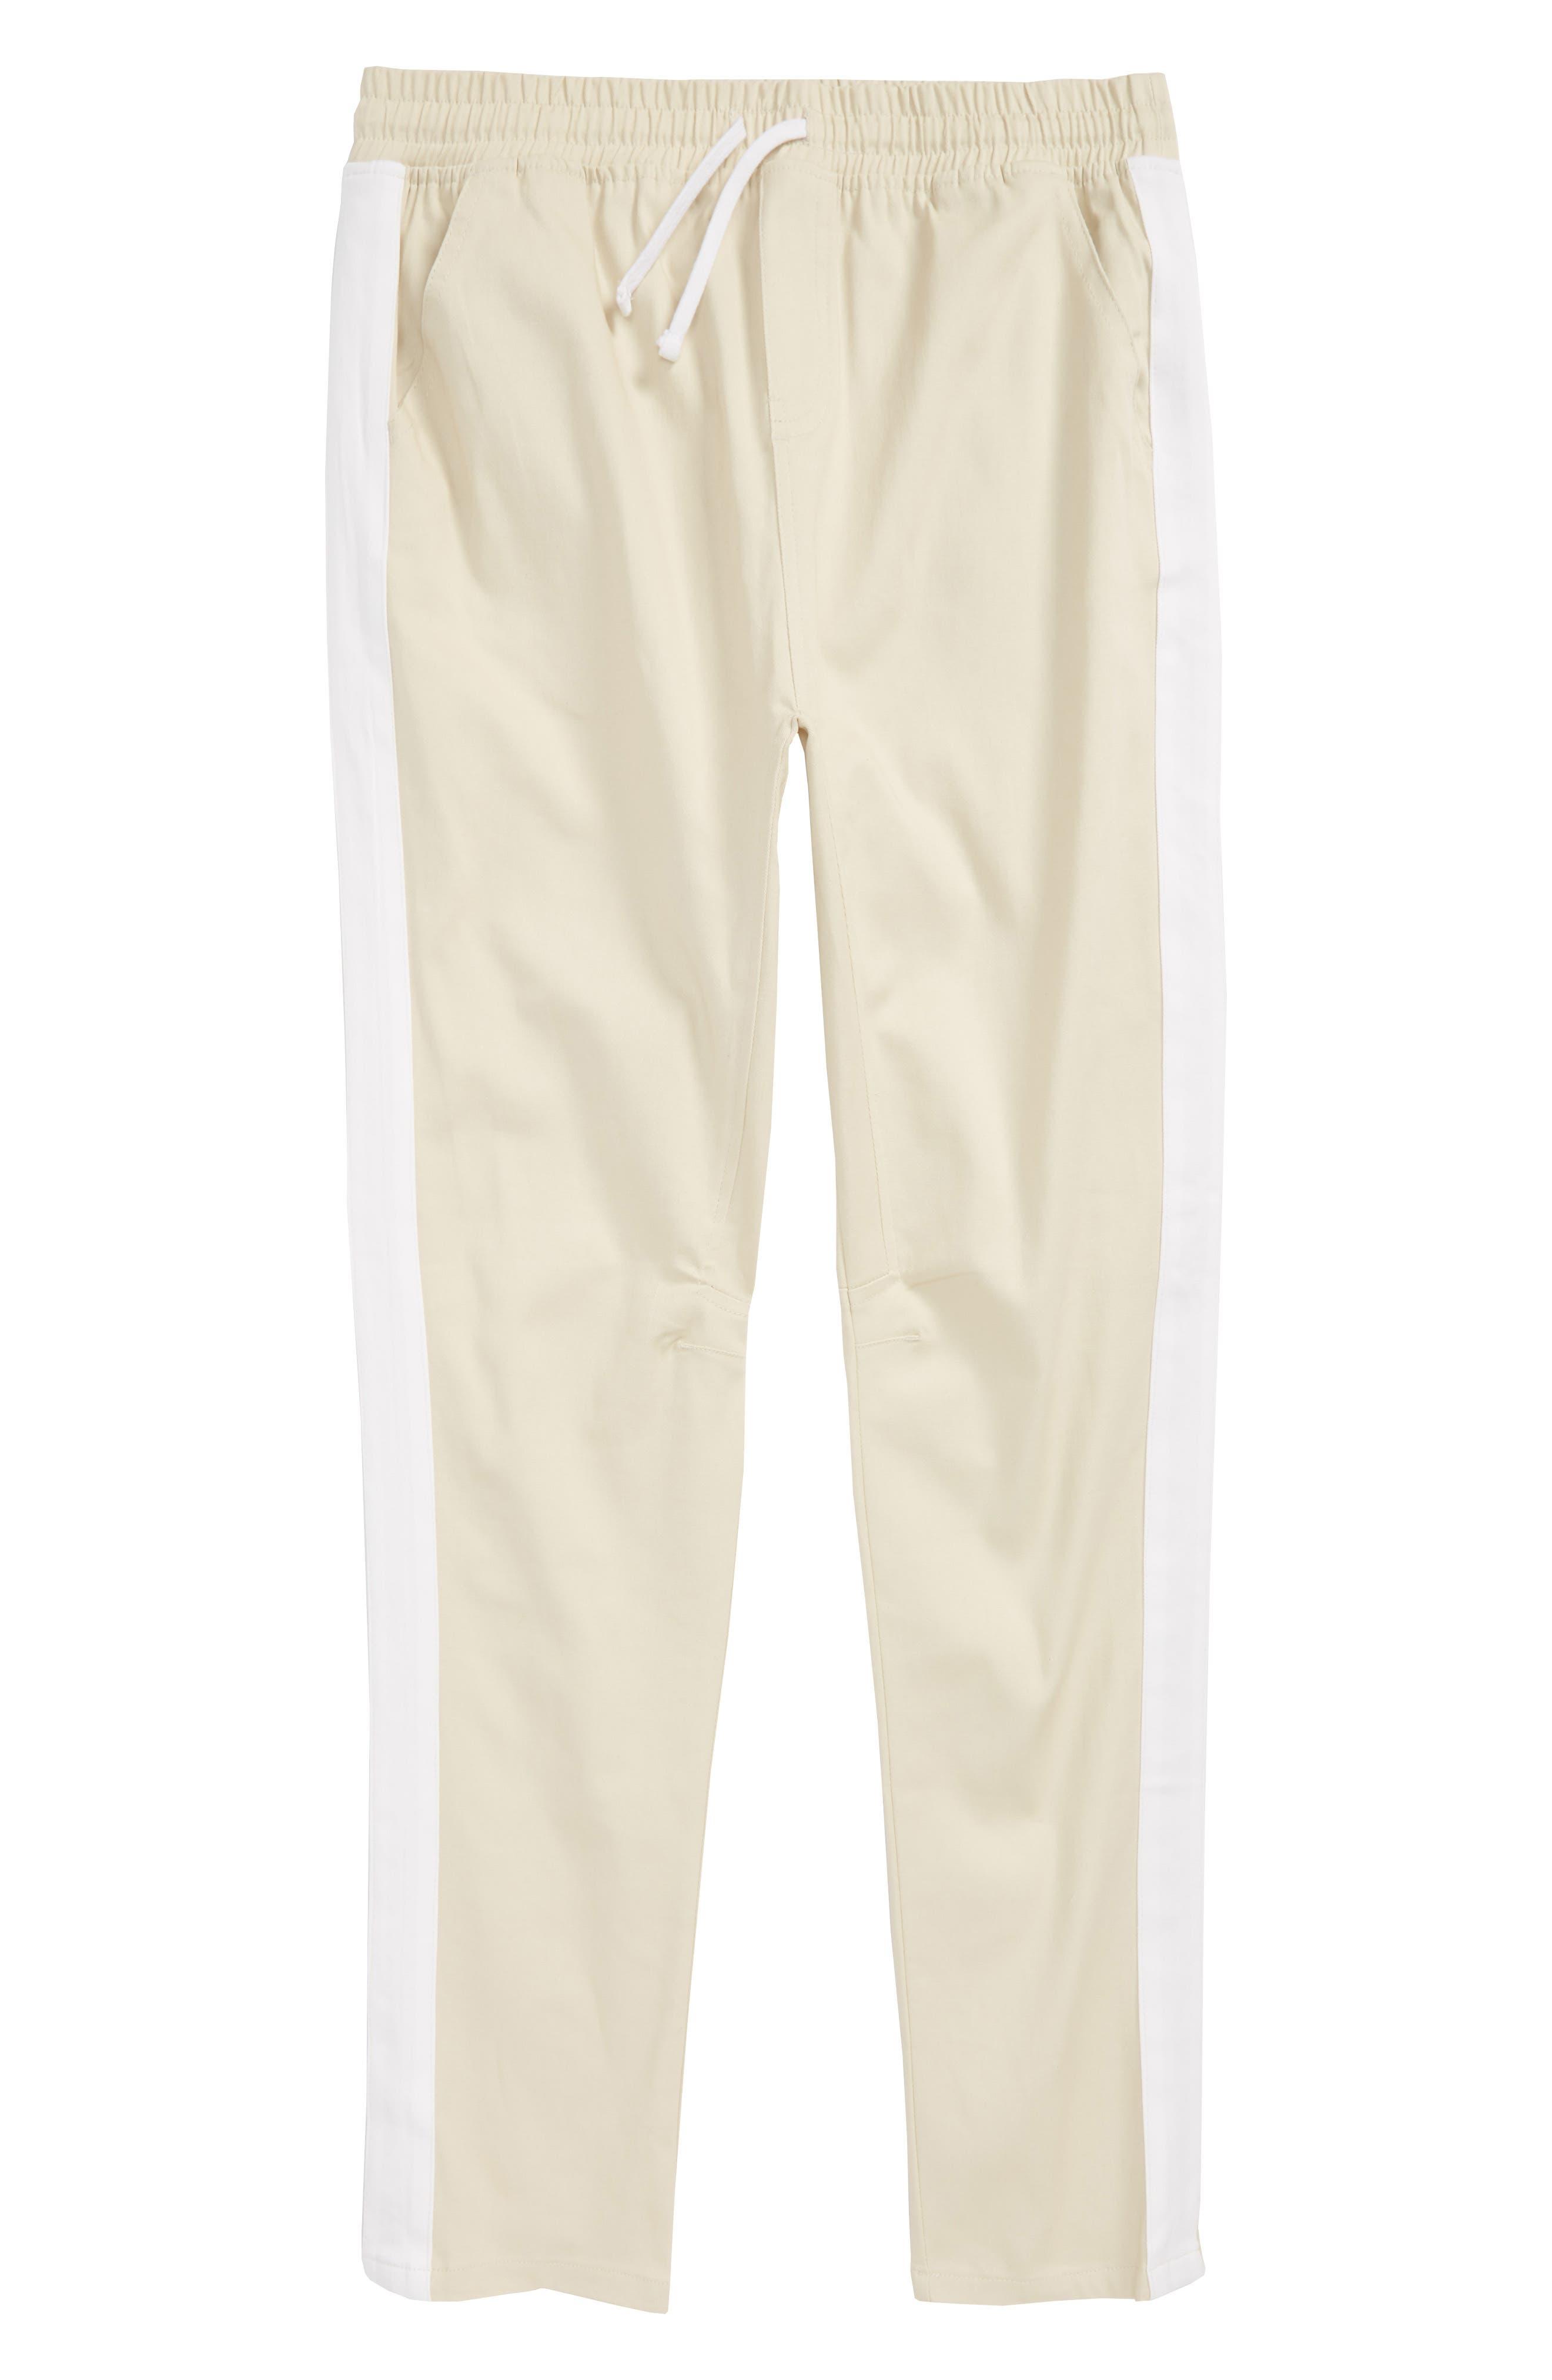 Gusset Track Pants,                         Main,                         color, 210